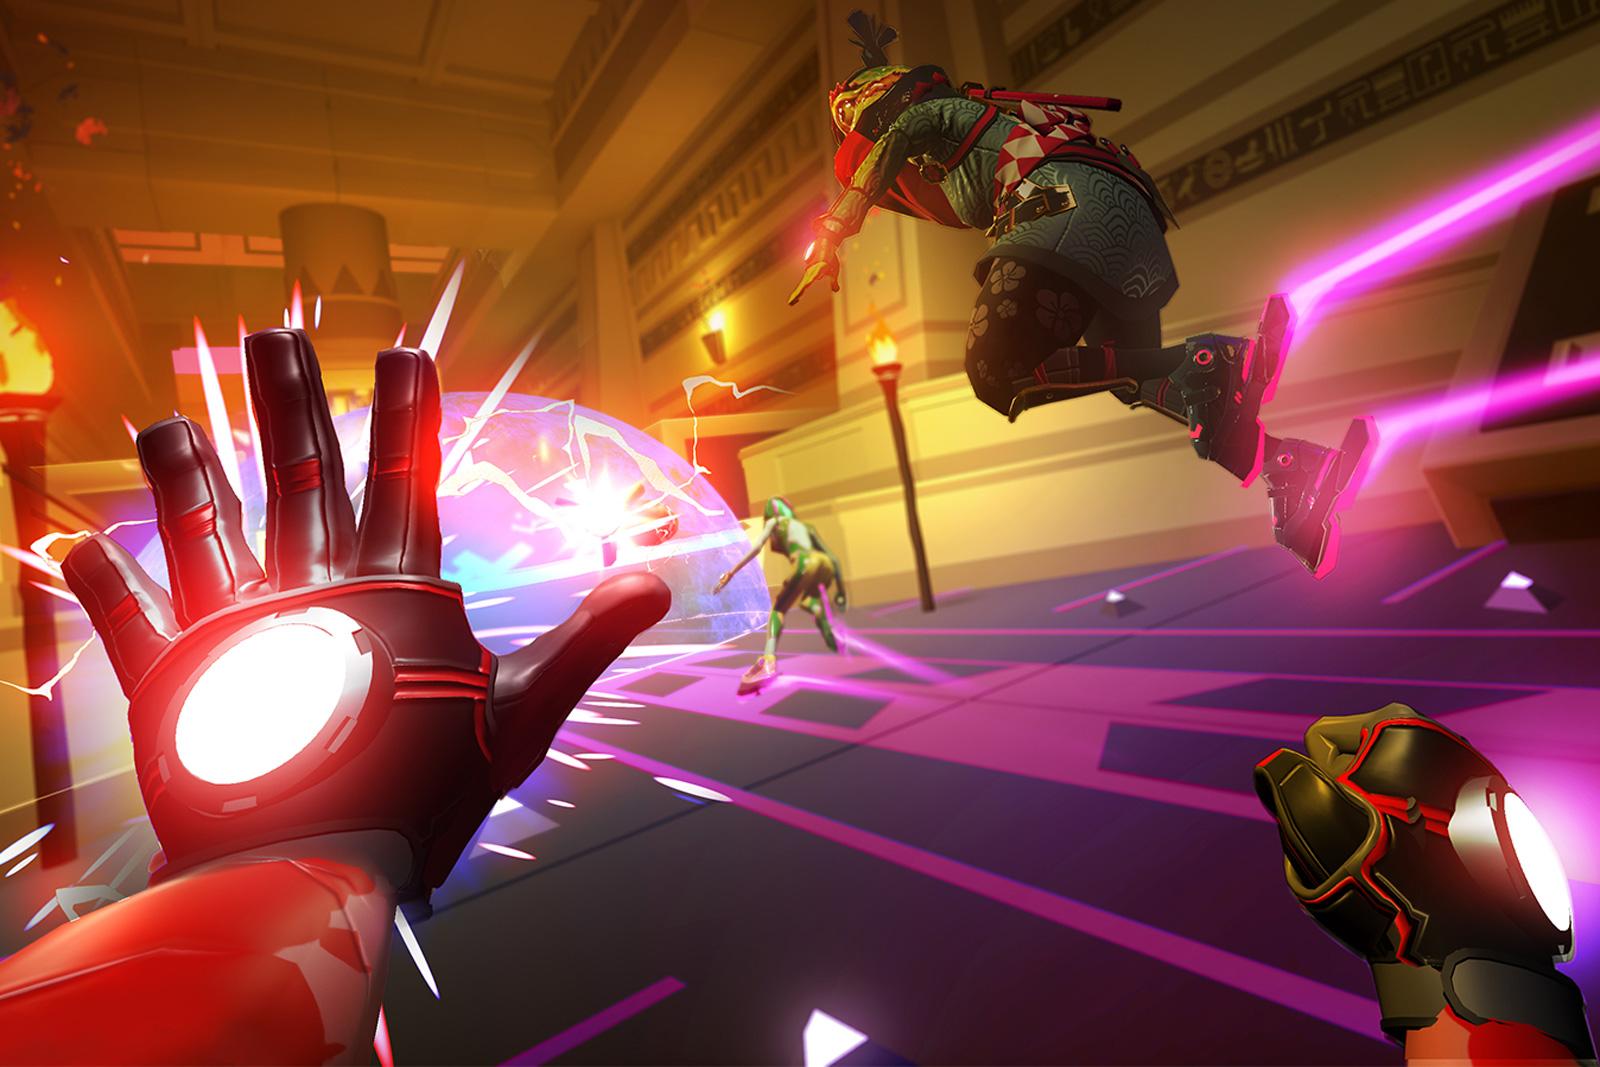 'Sprint Vector' brings VR foot racing to PlayStation 4